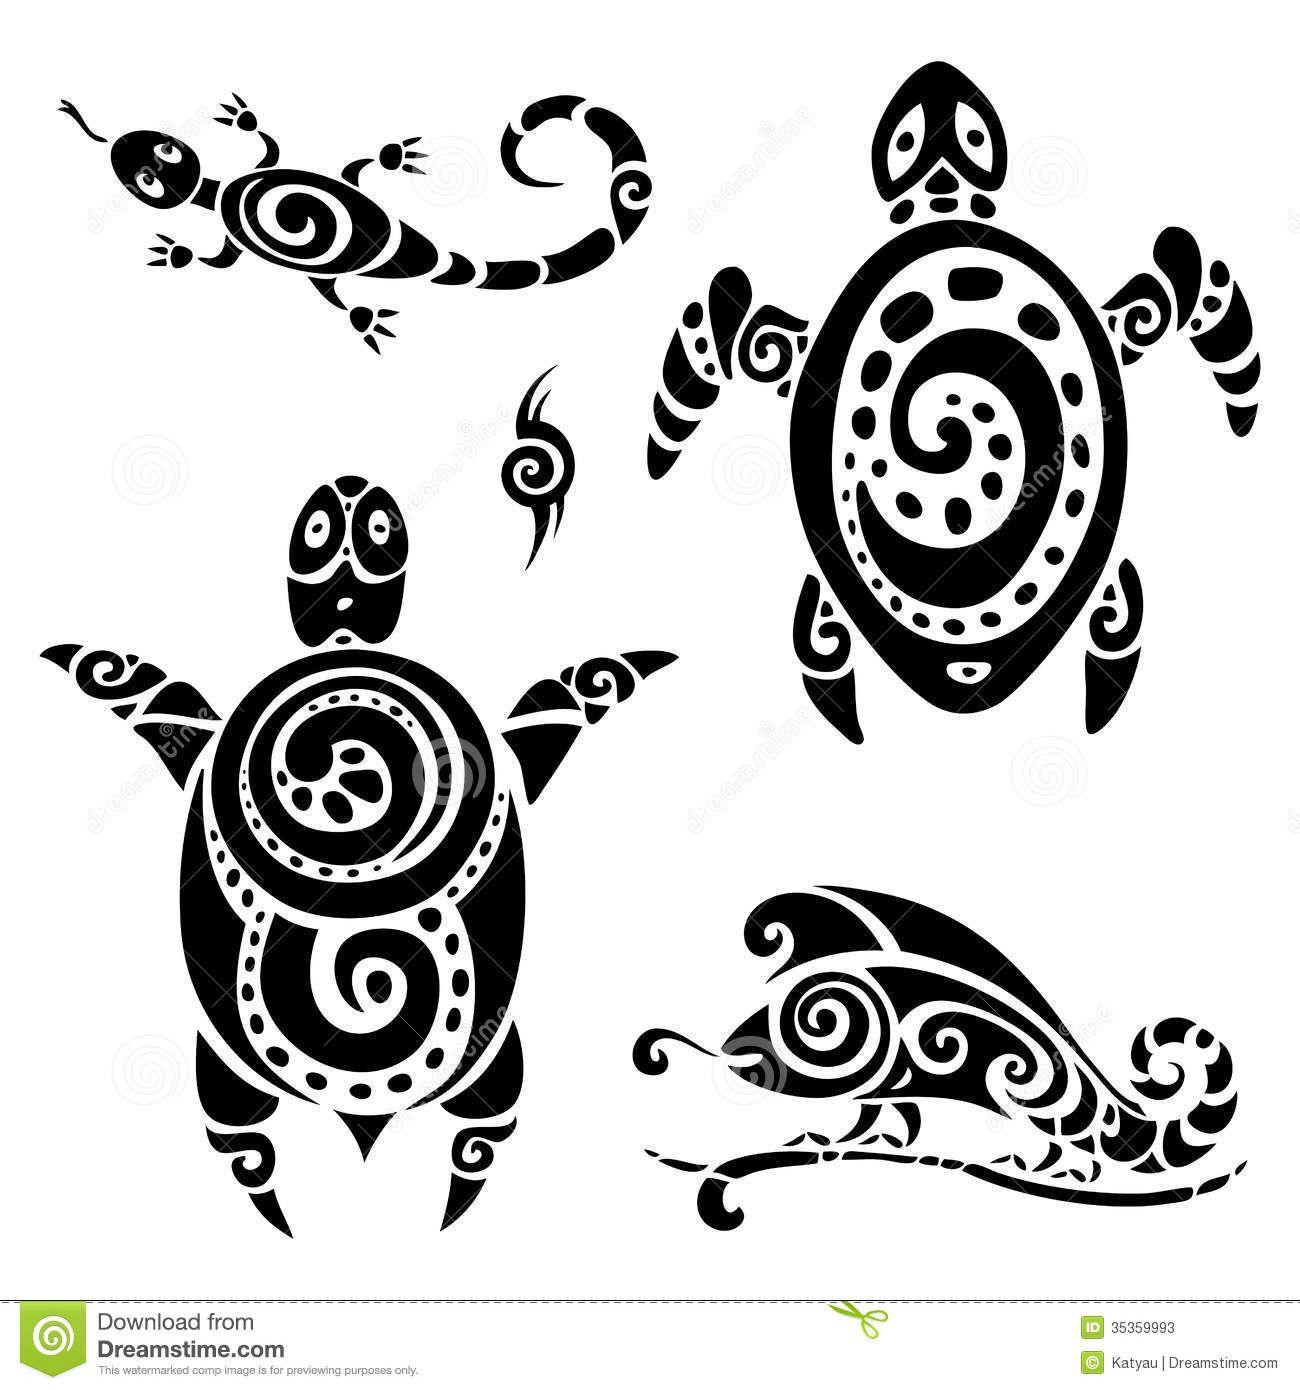 simbolos animales maori Cerca amb Google simbols maor